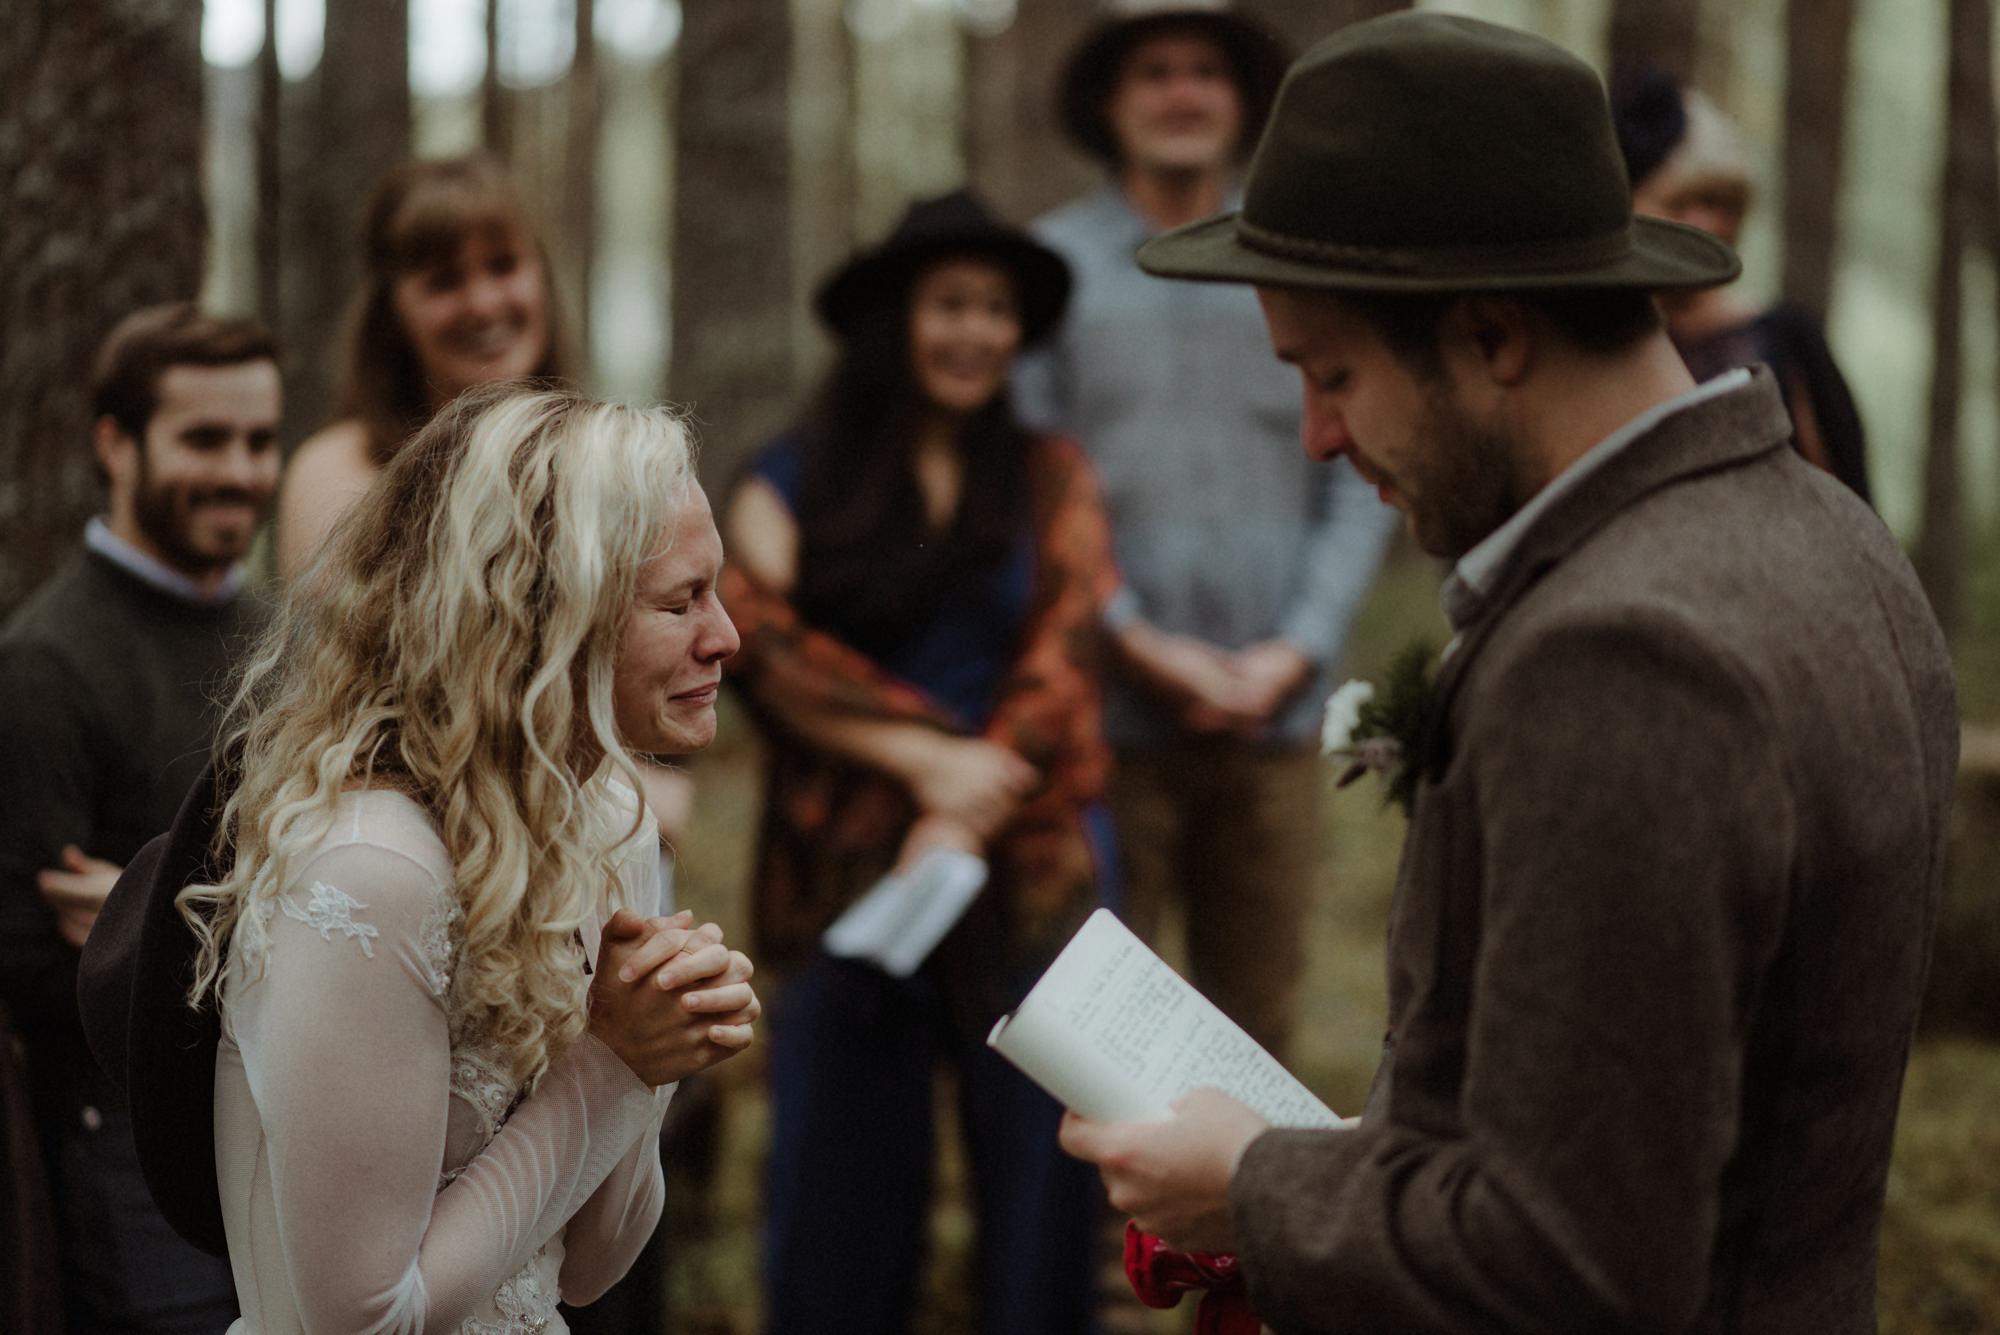 bride-cries-tears-of-joy-at-ceremony-worlds-best-wedding-photos-the-kitcheners-scotland-wedding